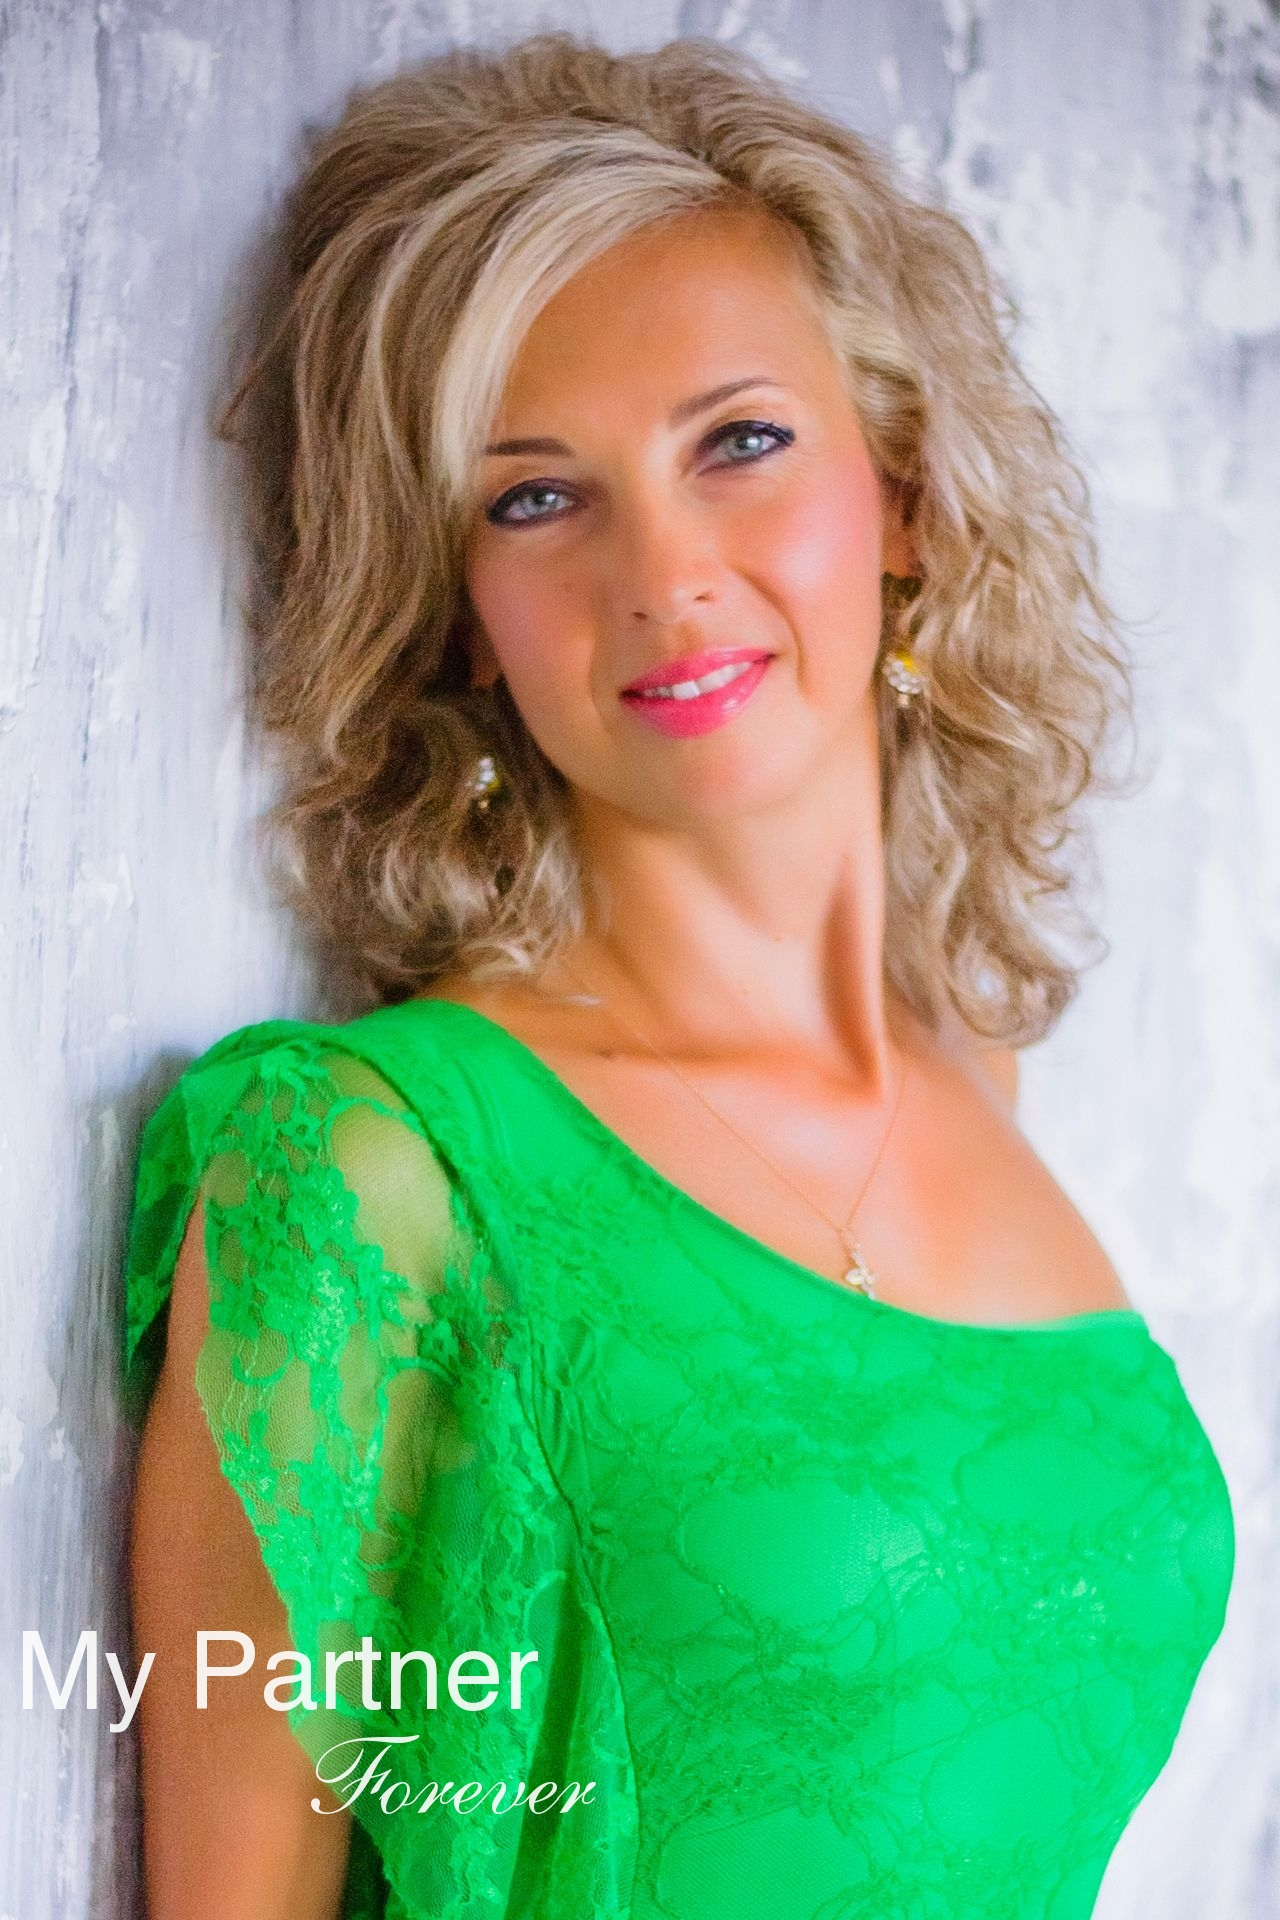 Meet Pretty Ukrainian Woman Tatiyana from Dniepropetrovsk, Ukraine